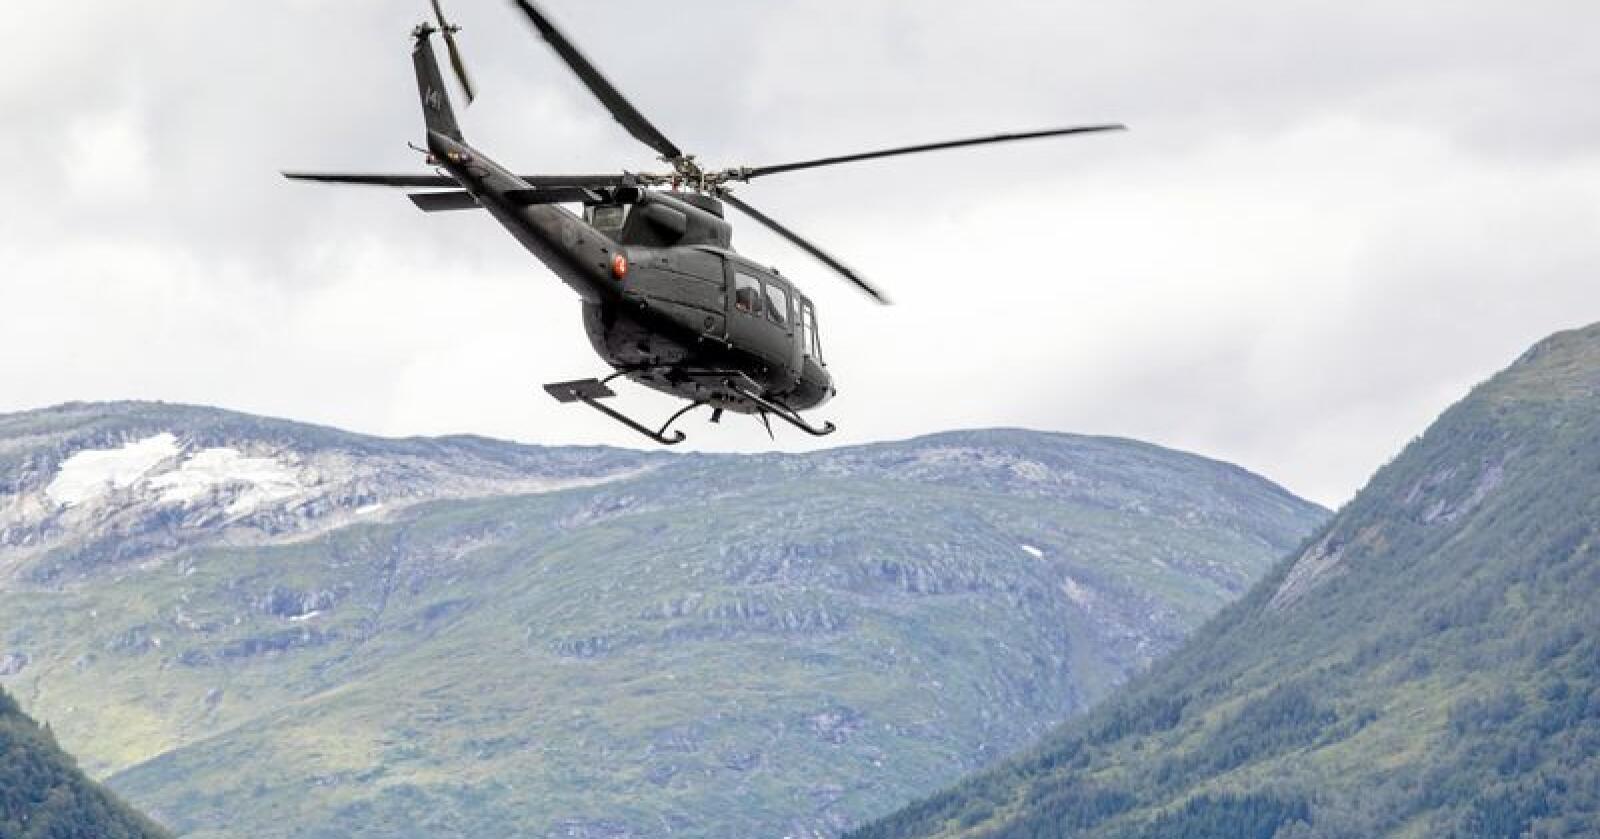 Helikopter:  Forsvaret skal flytte seks av ni Bell helikoptre fra Bardufoss til Rygge. Foto: Audun Braastad/NTB scanpix